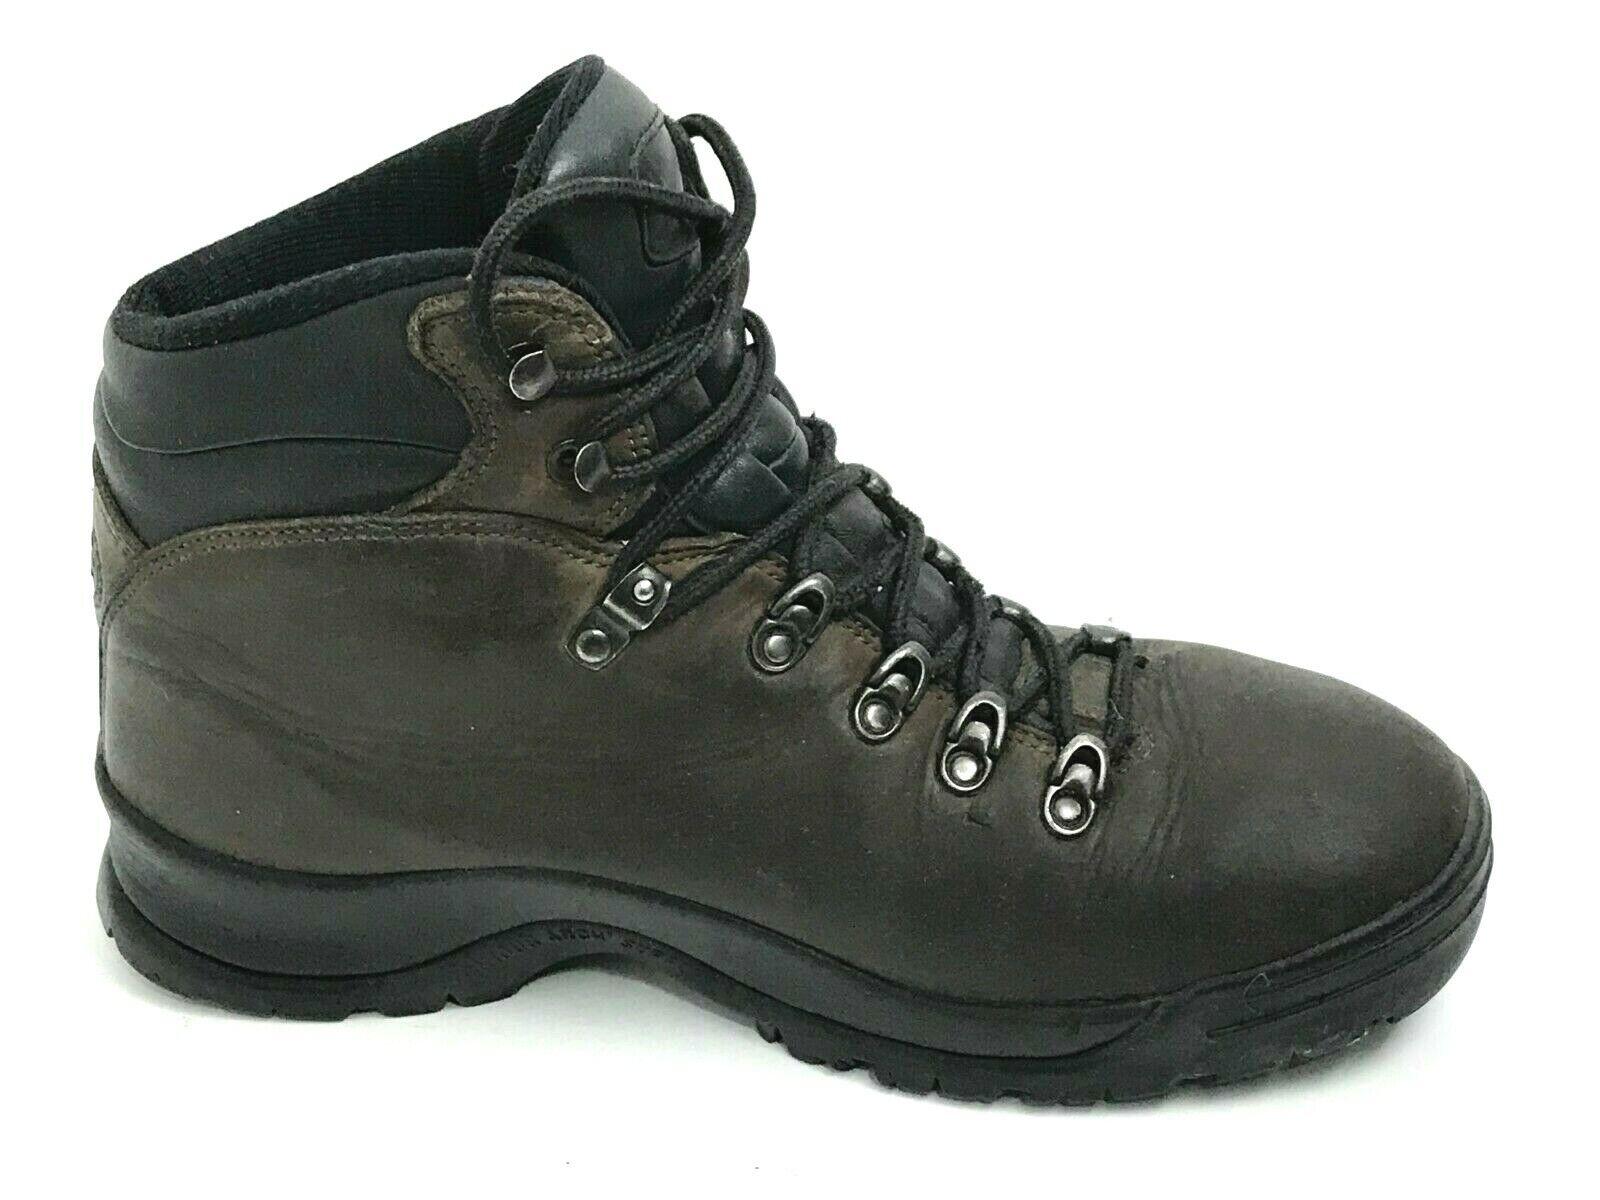 Vasque Men's Marroneee Mountain Hiking stivali Dimensione US.9.5 EU.42.5 UK.8.5 UK.8.5 UK.8.5 ed456f